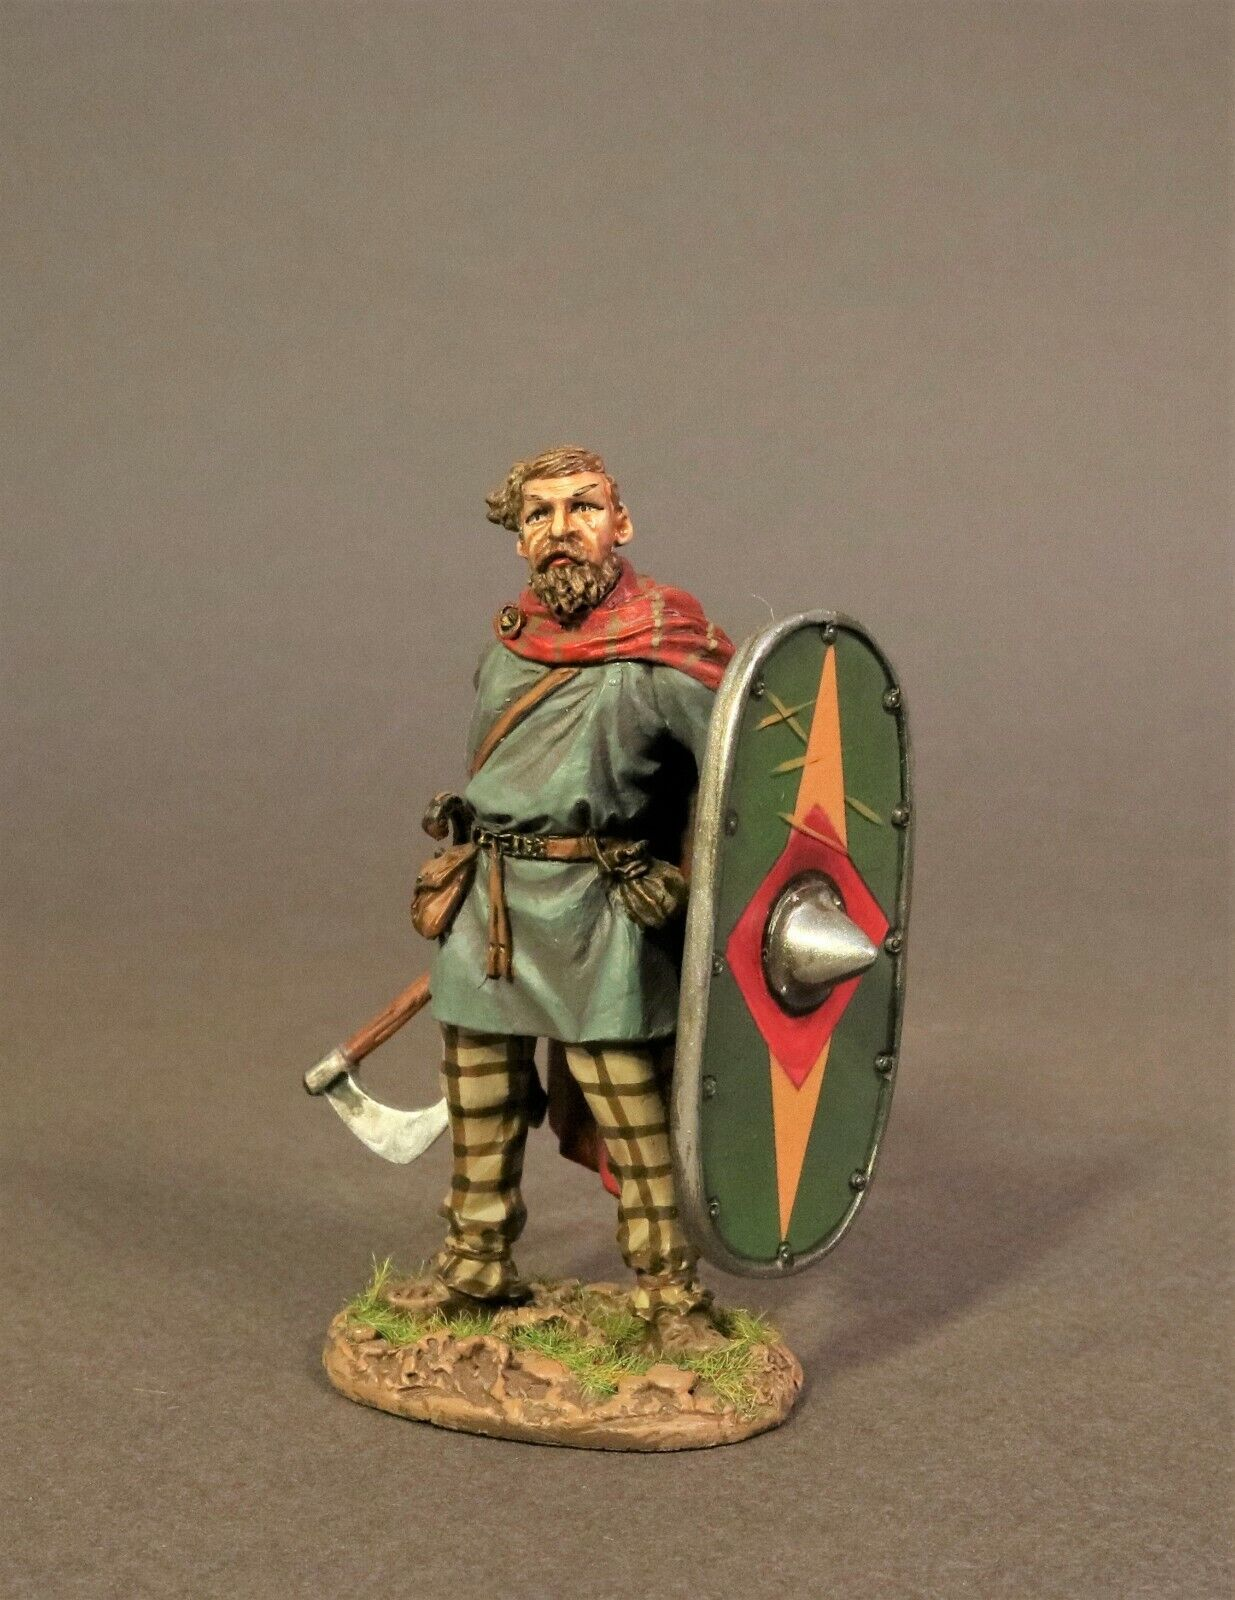 John Jenkins Romana Impero Età di Arthur Ag-01a Gallia Cherusci Guerriero Ascia